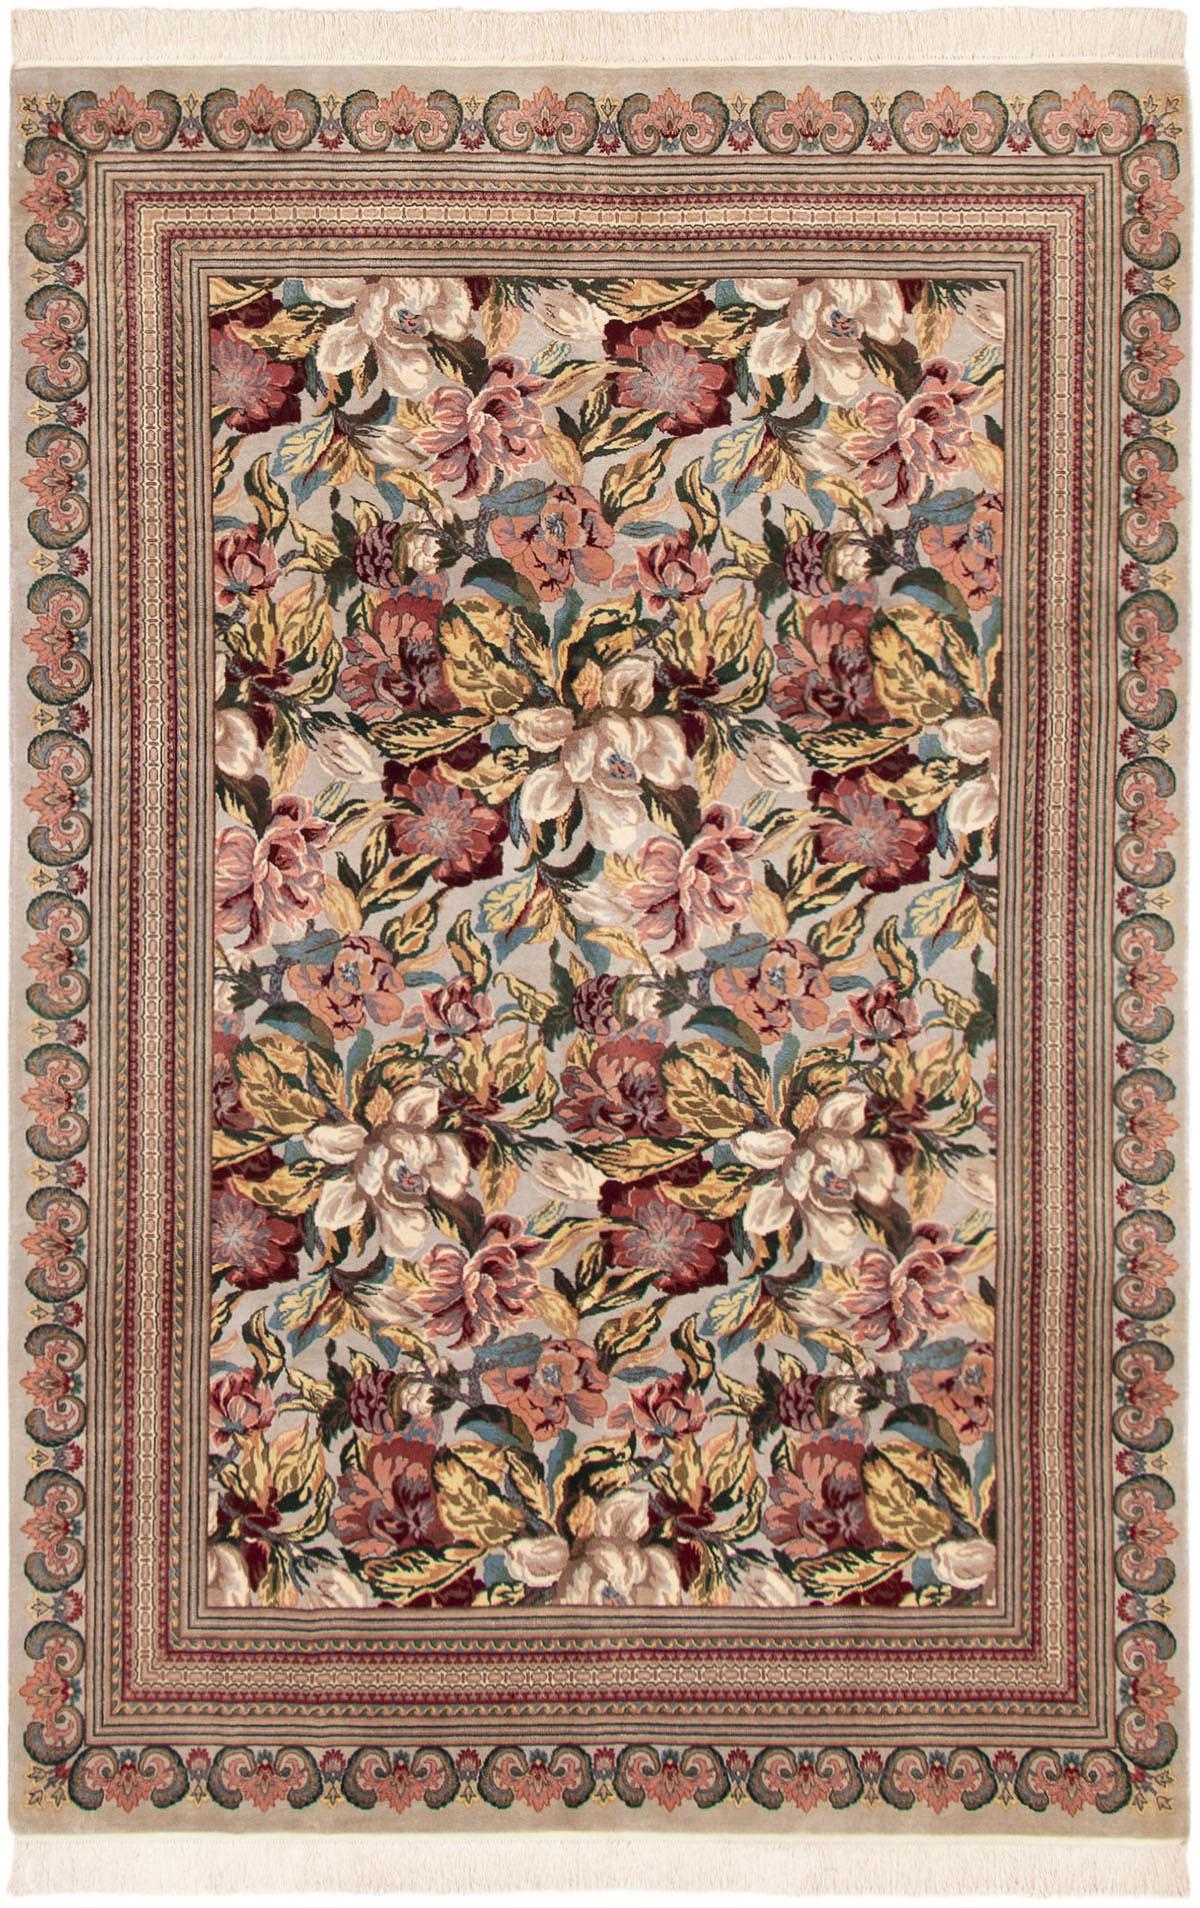 "Hand-knotted Pako Persian 18/20 Light Grey Wool Rug 6'1"" x 9'3"" Size: 6'1"" x 9'3"""